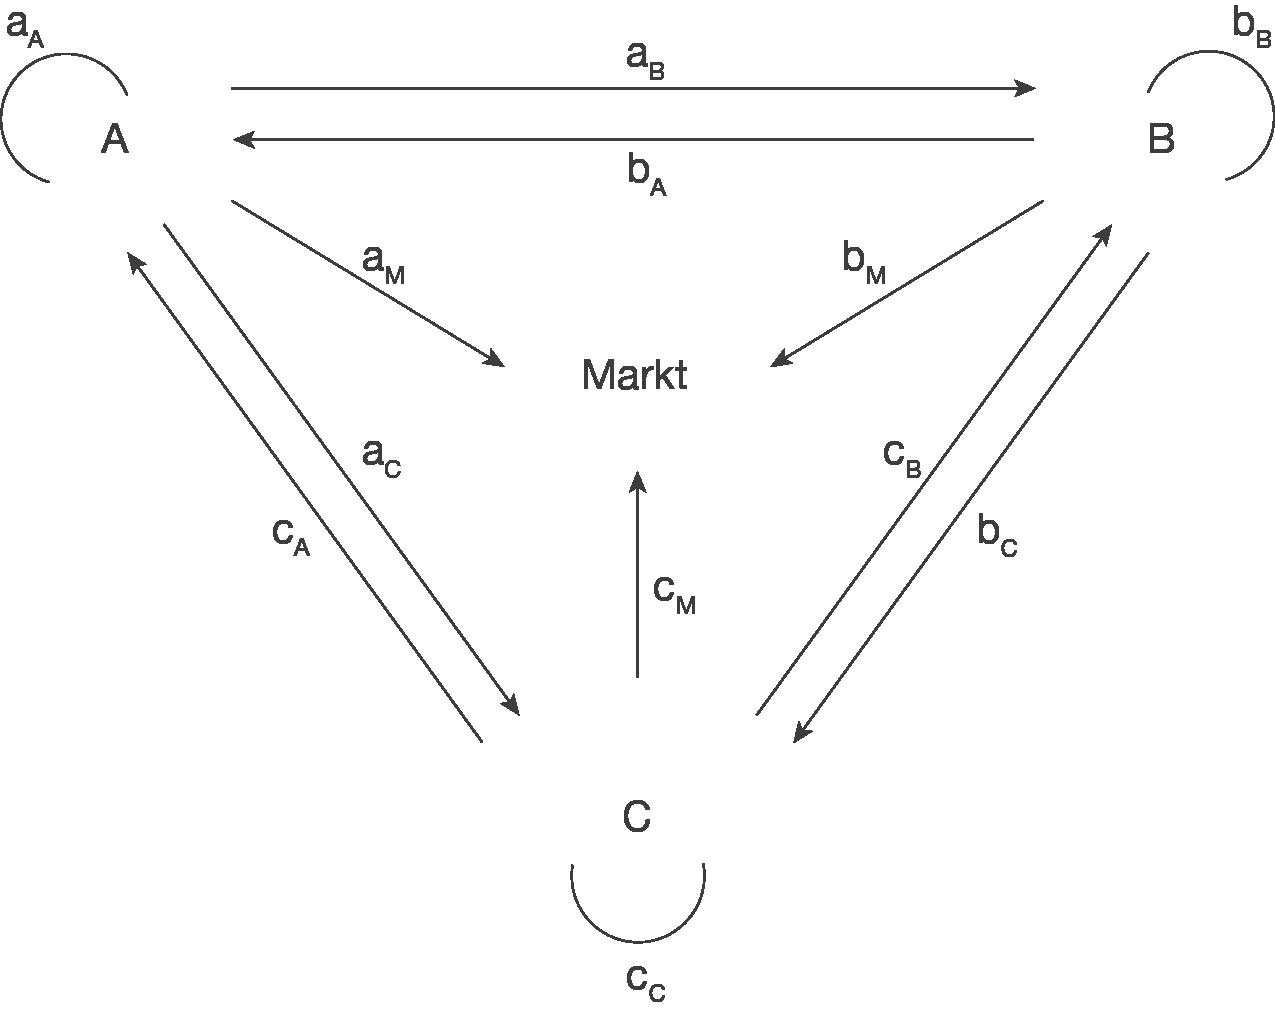 Leontief-Modell: Verflechtungsdiagramm